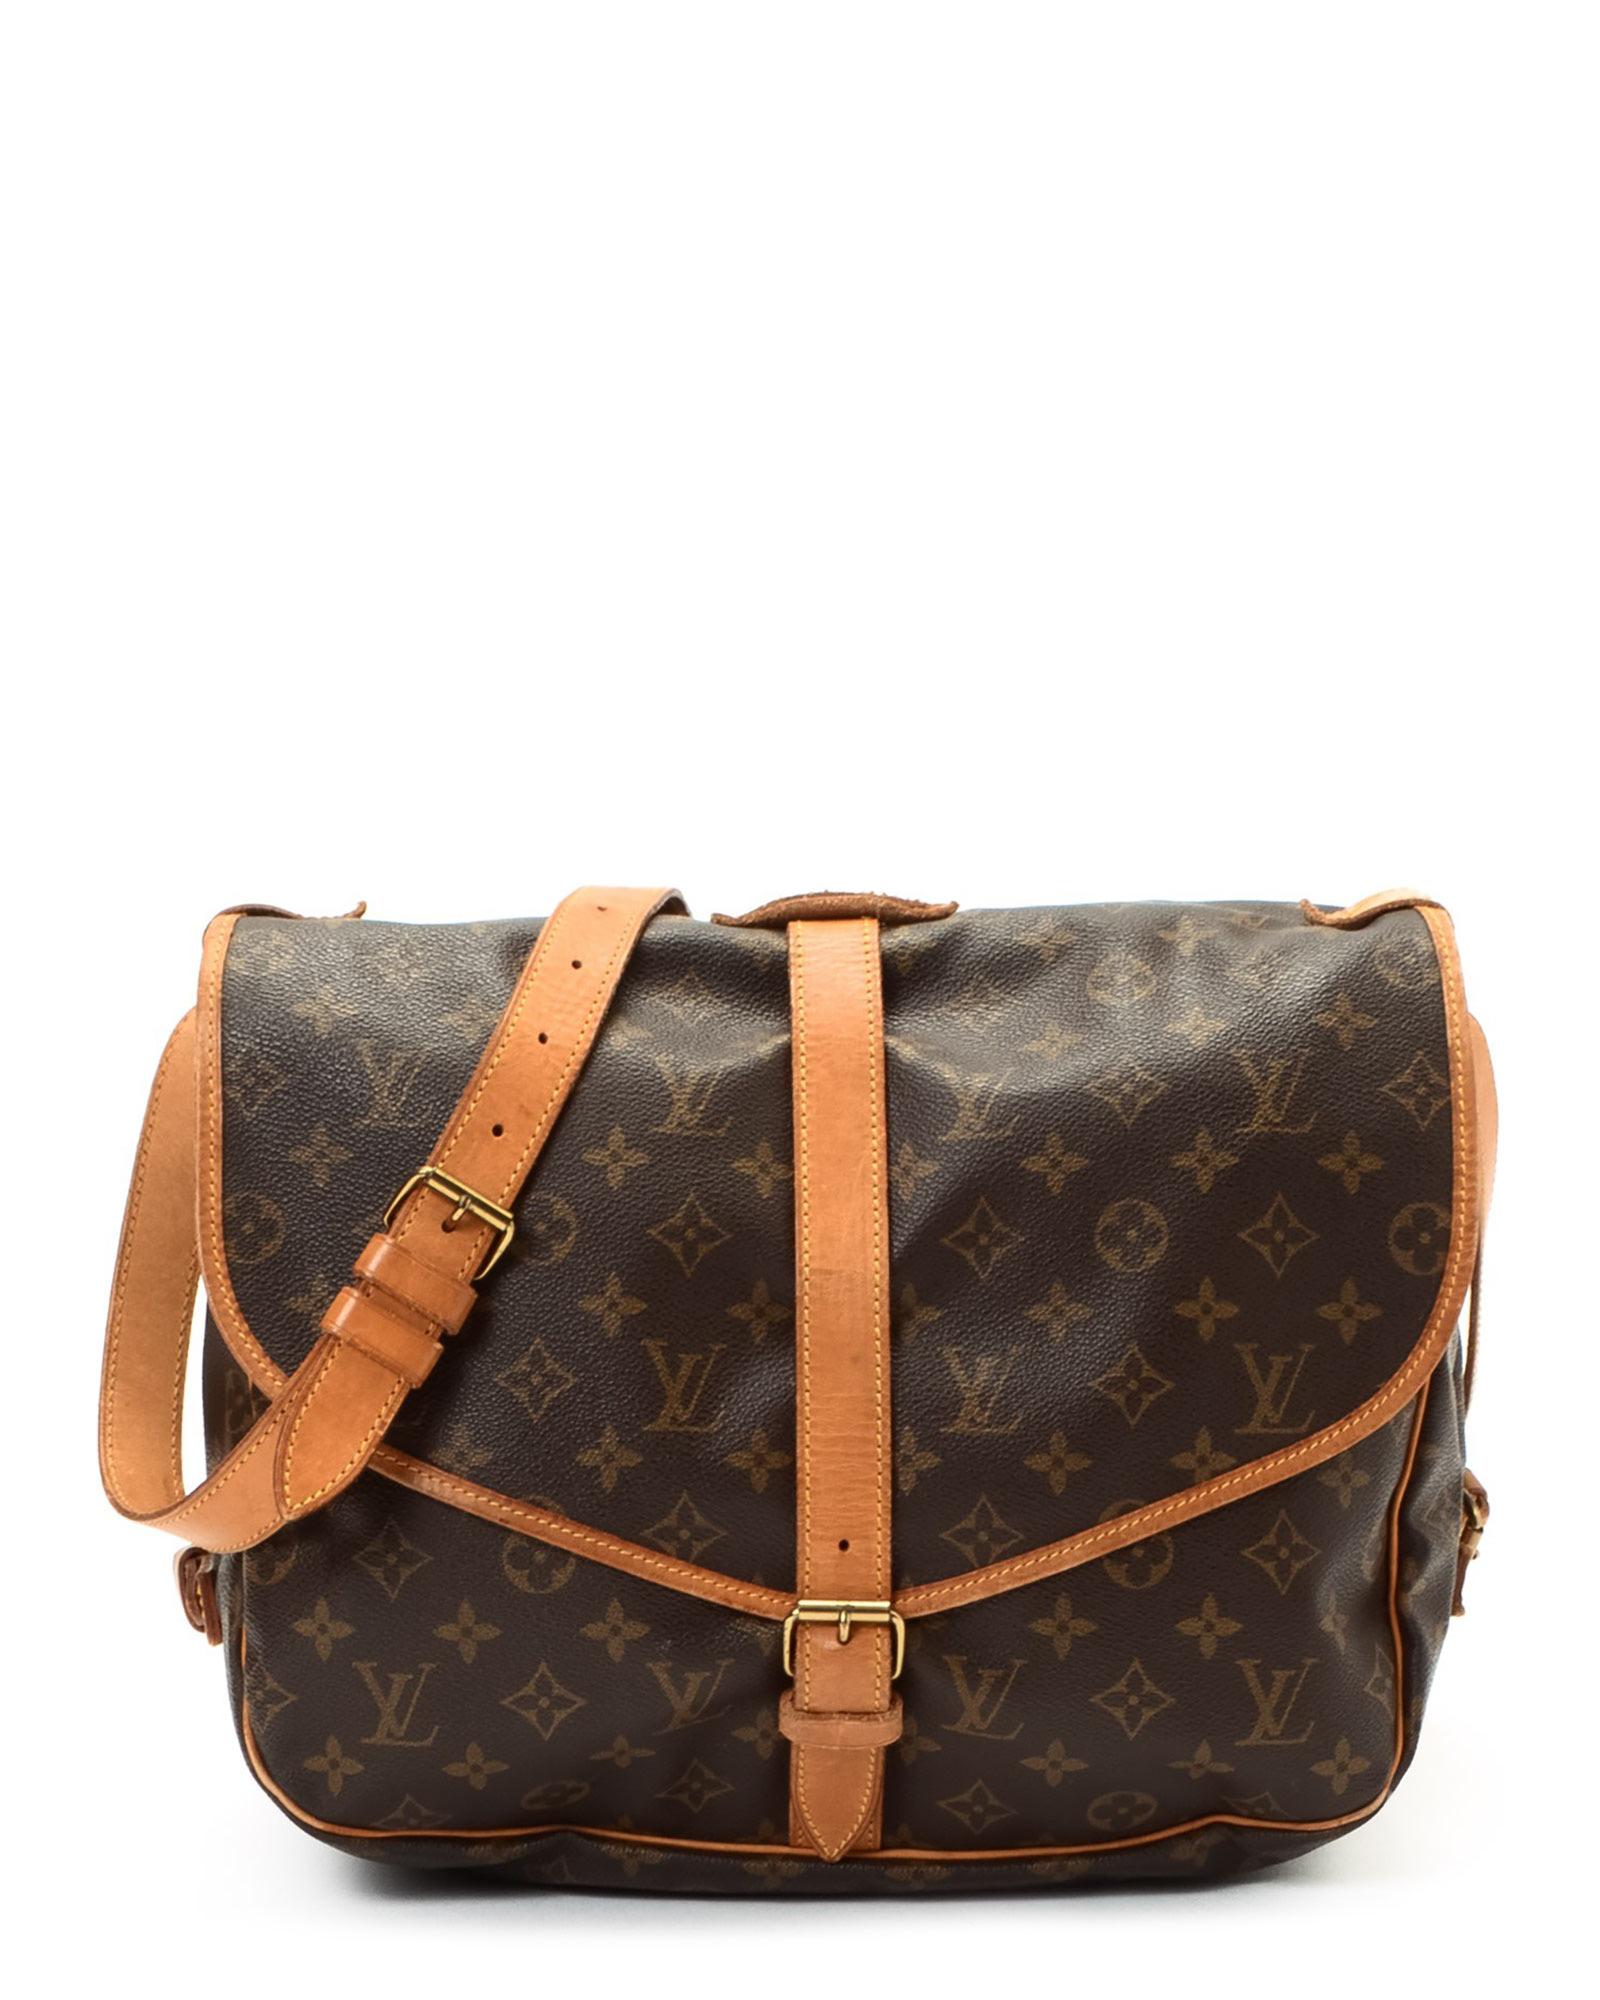 ... vintage louis vuitton mens bags ... 1cc23e7abb6